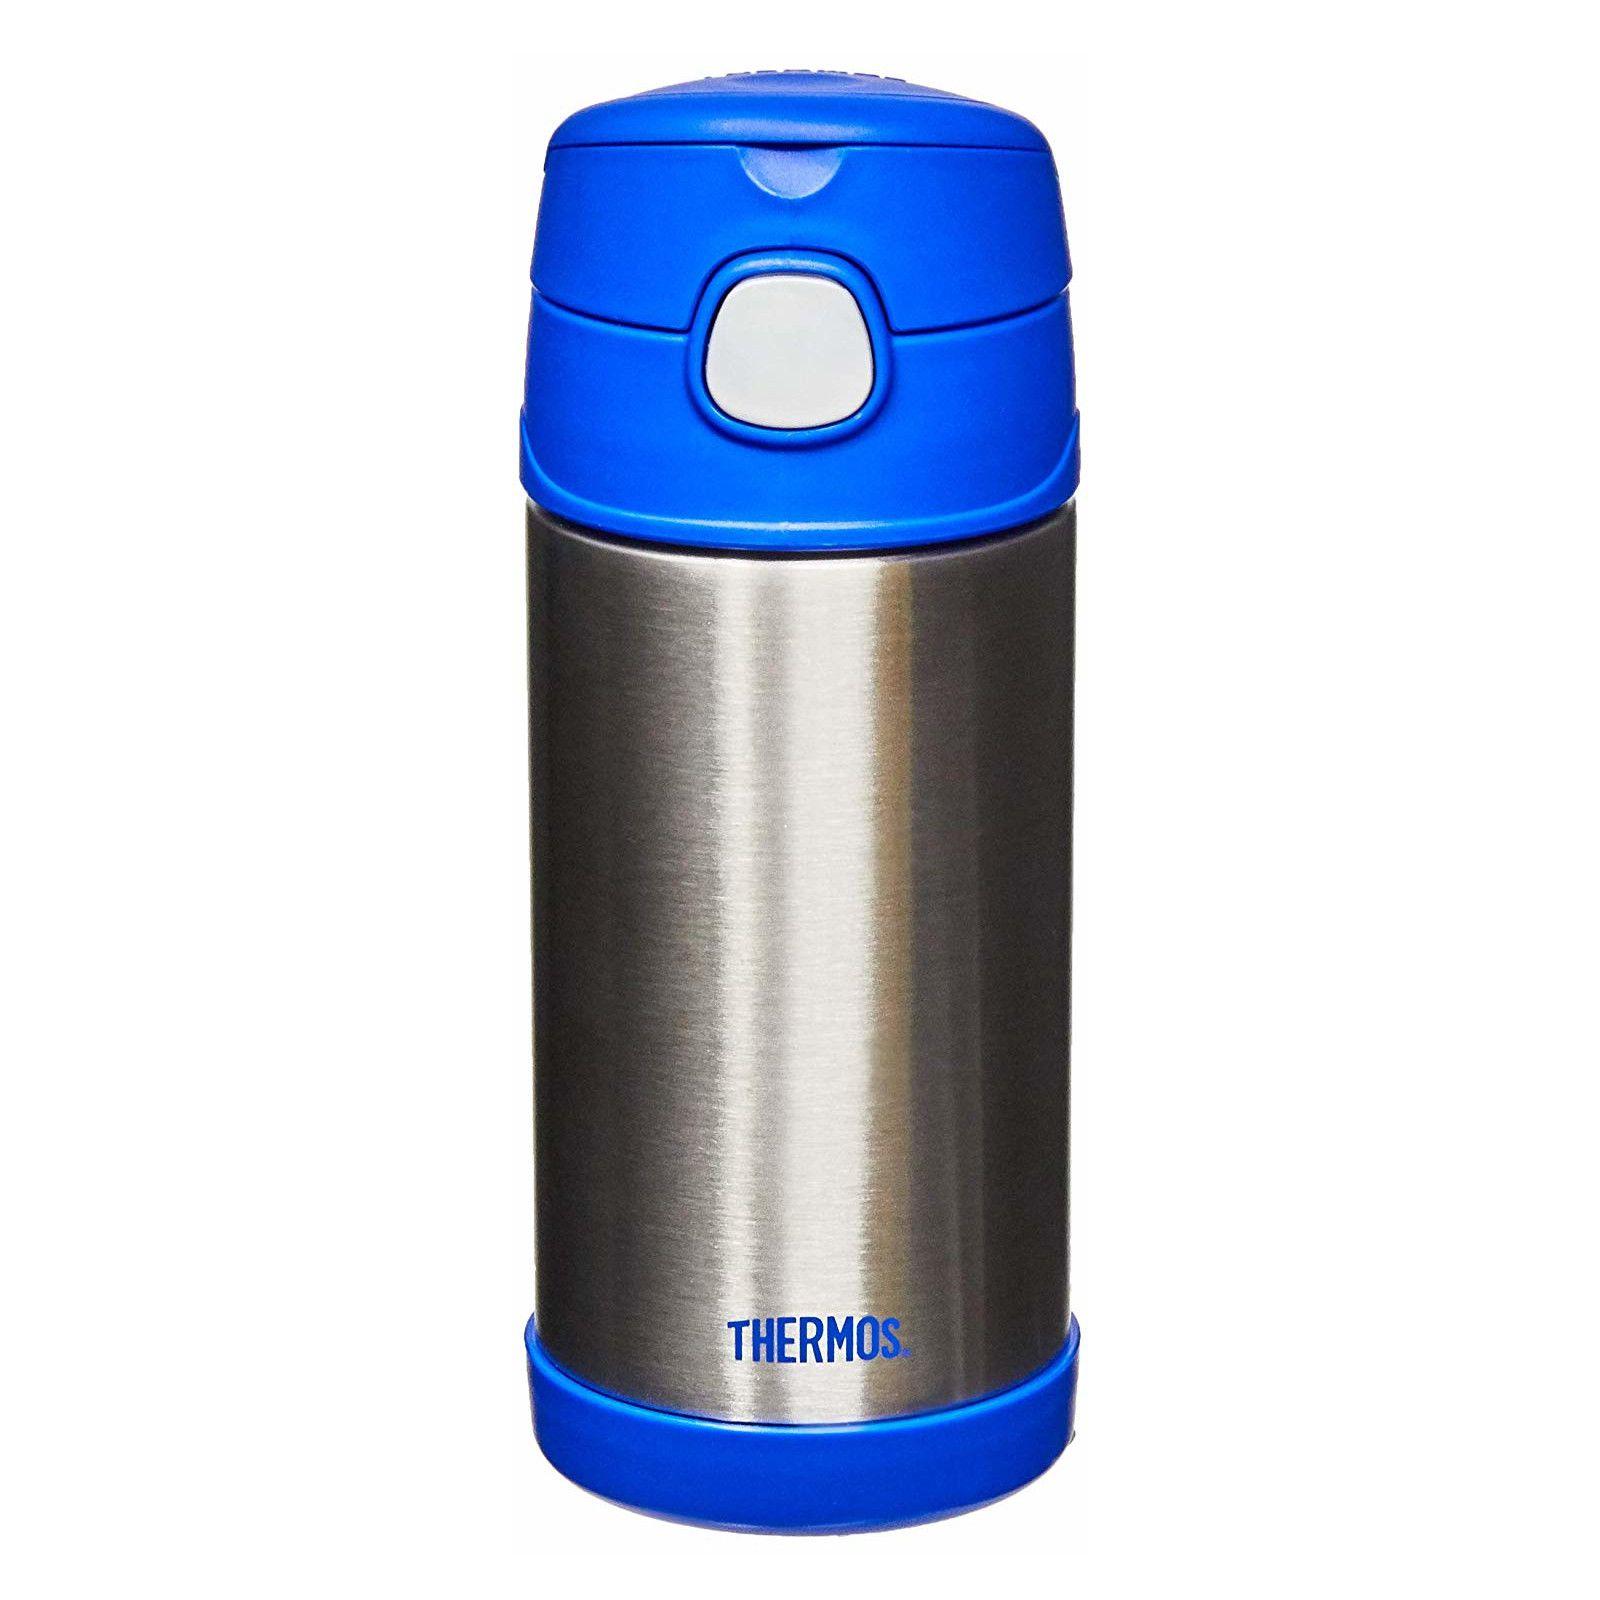 Garrafinha Térmica Funtainer 355 ml Azul e Inox Thermos